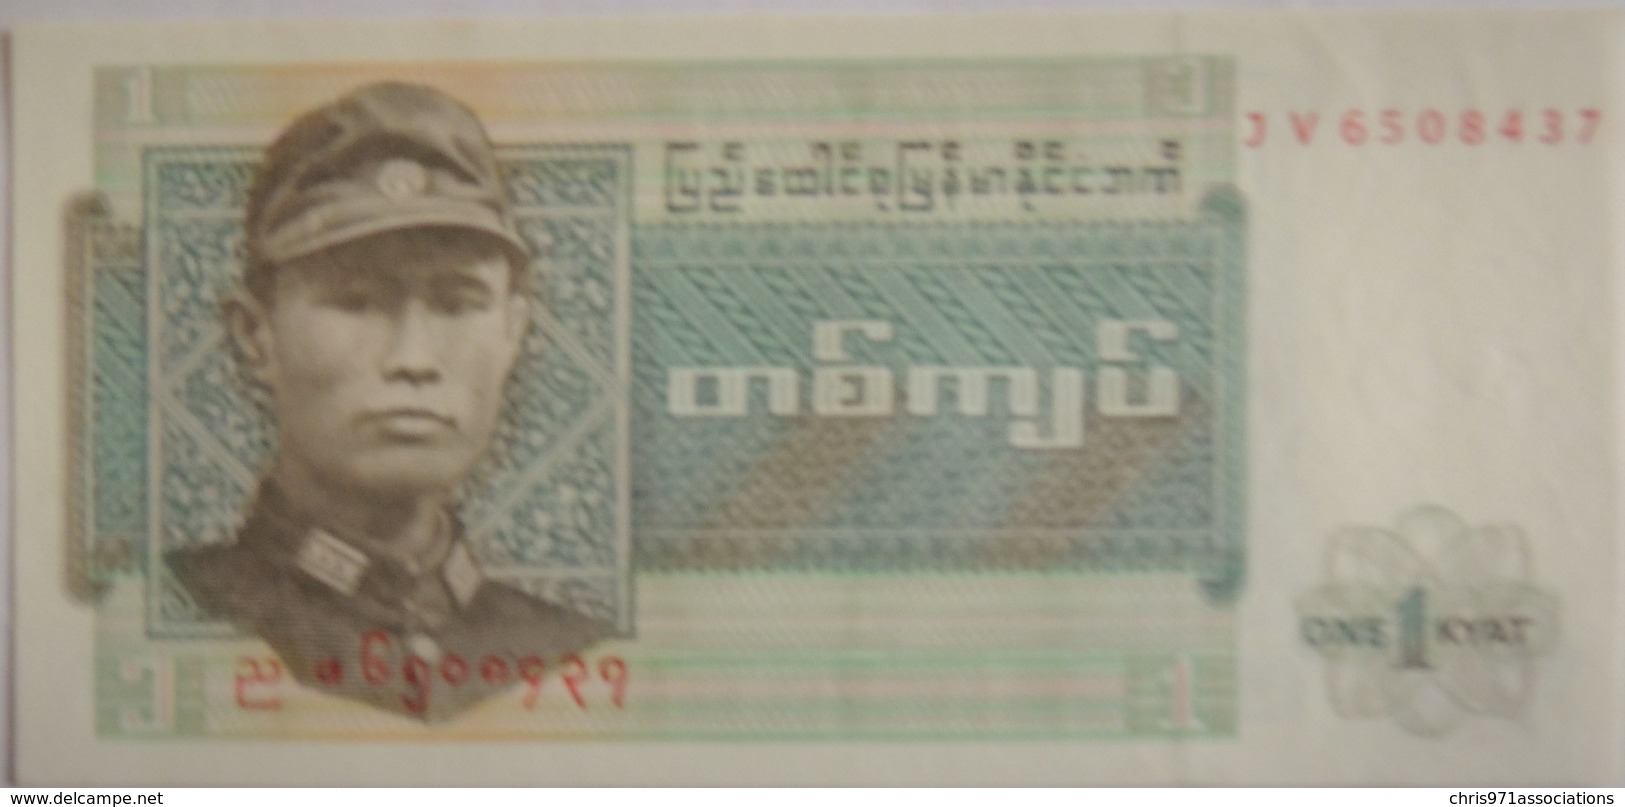 Billet De Myanmar (Birmanie) 1 Kyat Pick 56 Neuf/UNC - Myanmar